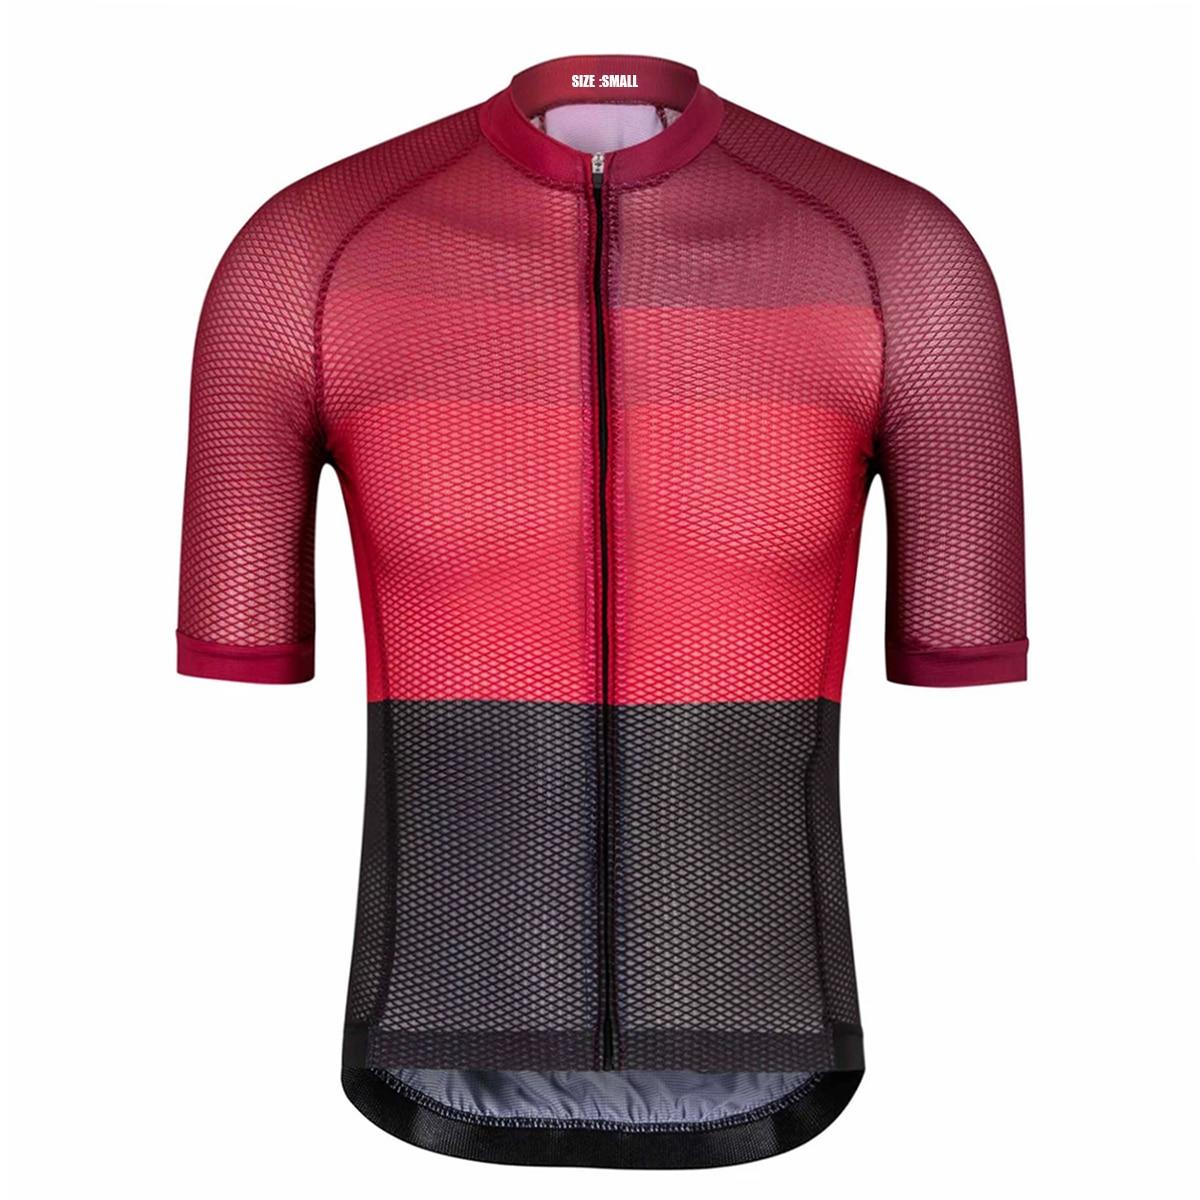 SPEXCEL 2019 New Climber's Summer Short Sleeve Cycling Jerseys Road Mtb Cycling Shirt Aero Fit Open Cell Mesh Fabric Custom